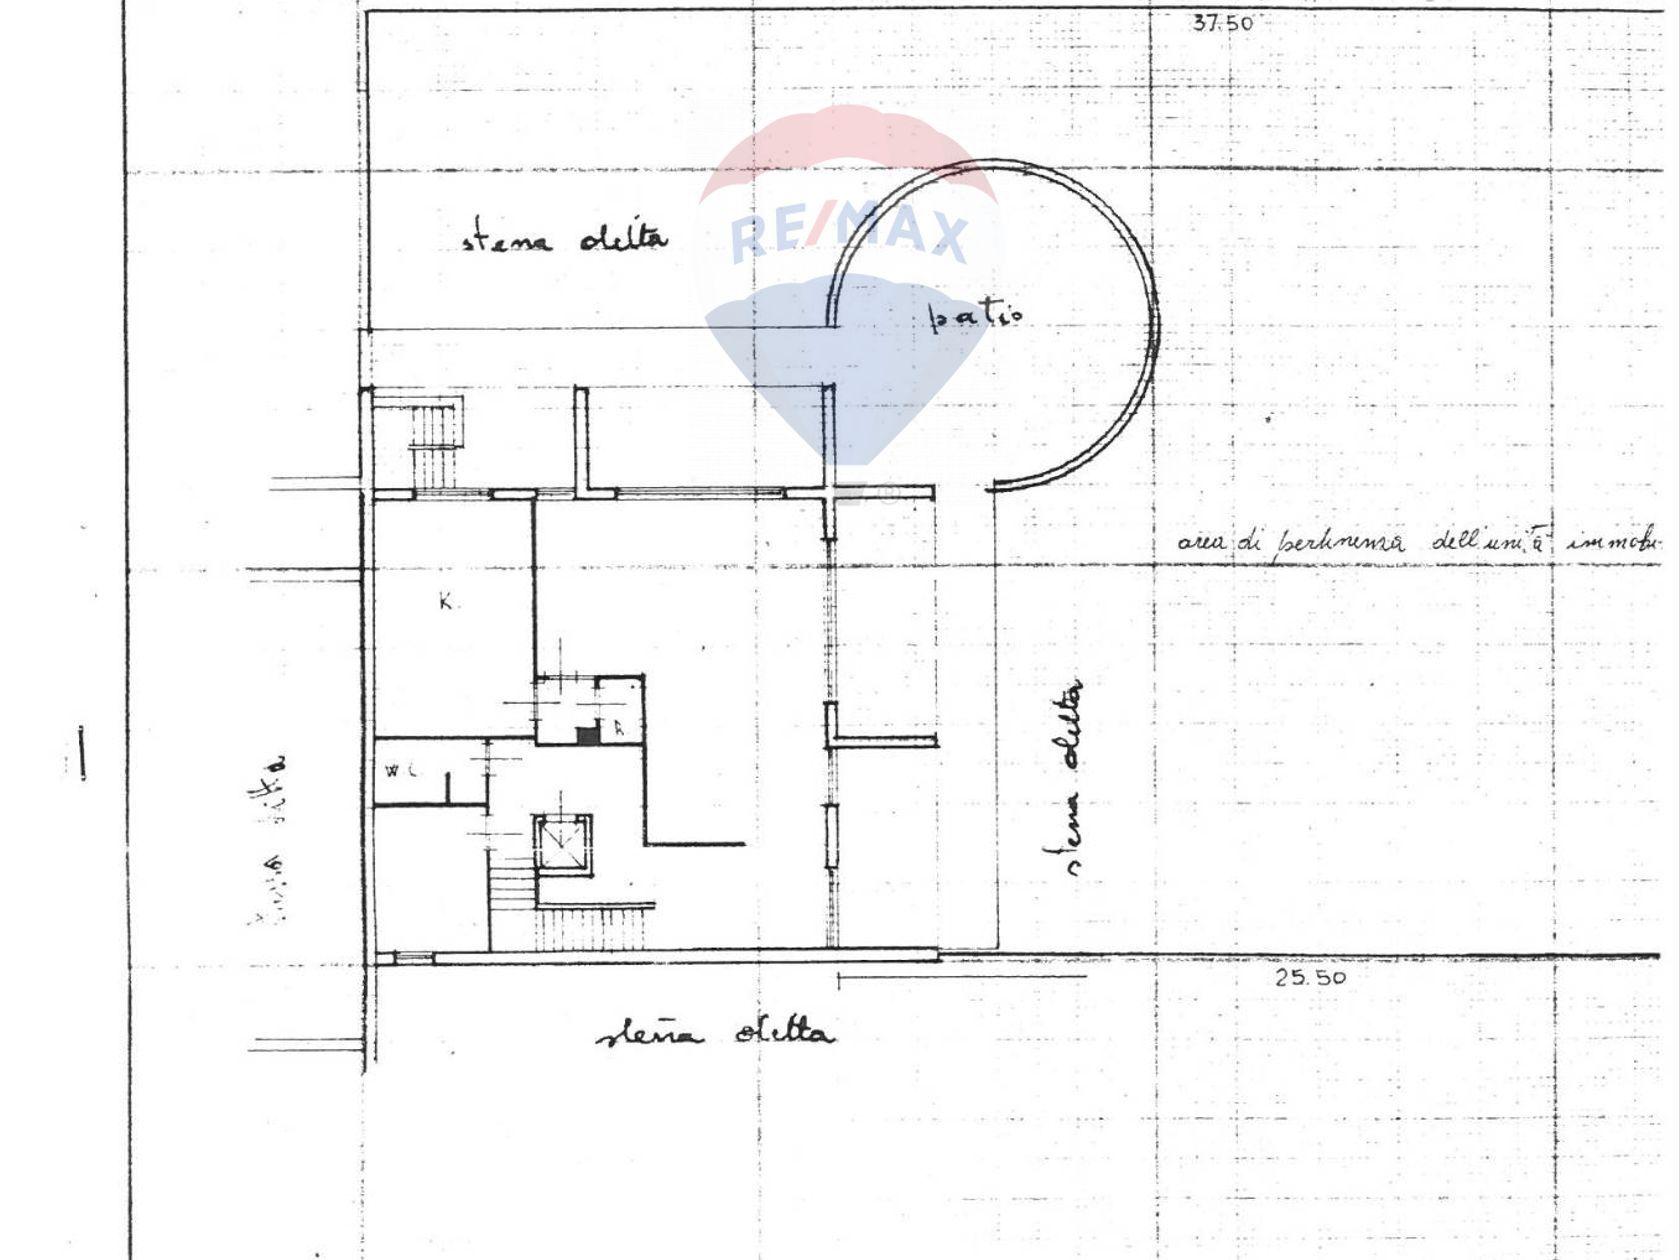 Villa a schiera S. Spirito, Bari, BA Vendita - Planimetria 3